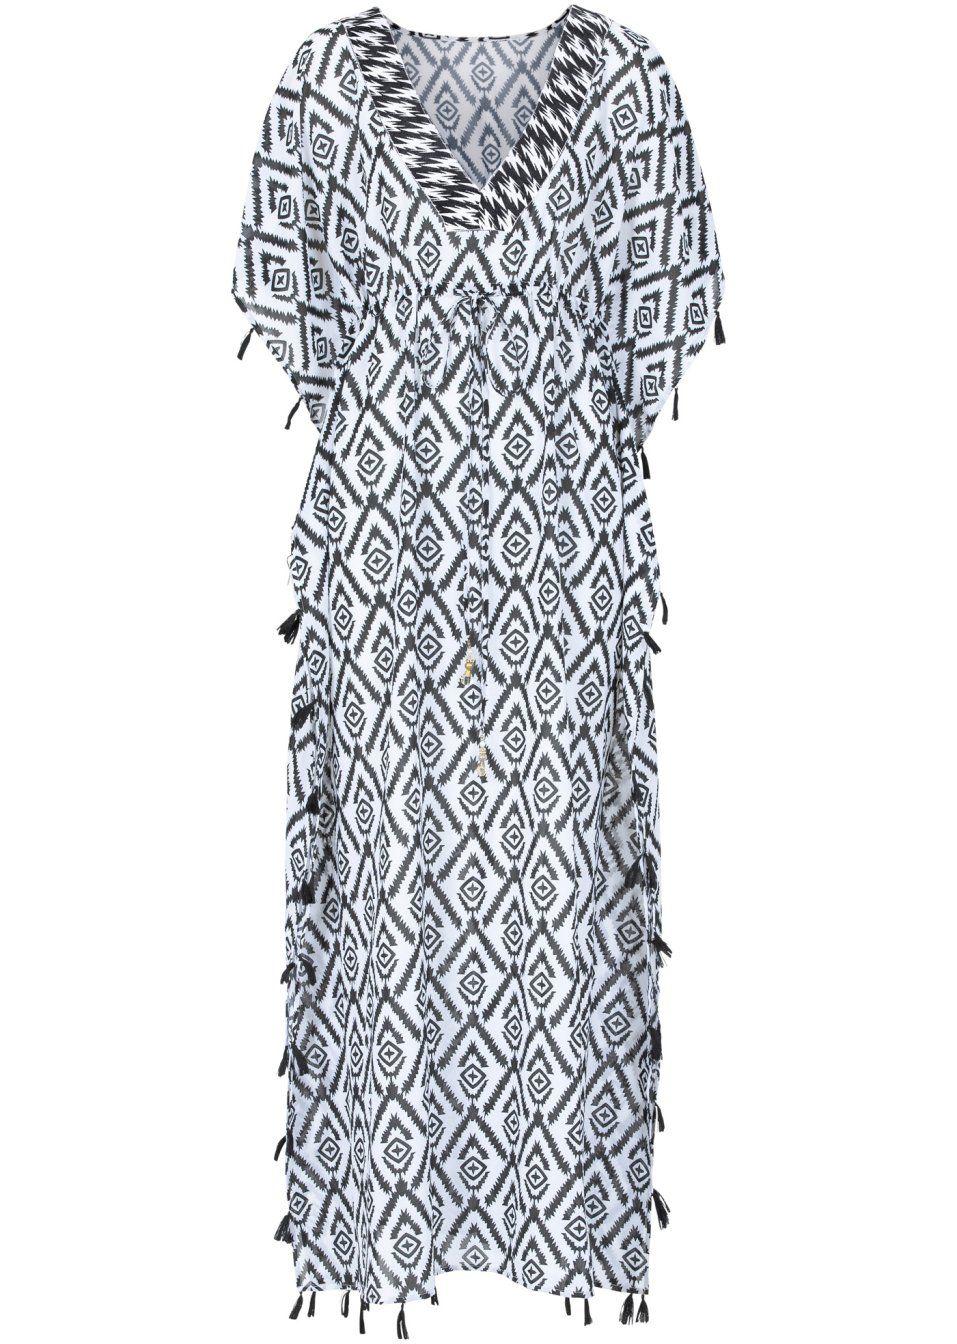 Strand Maxikleid | Strandkleid, Strandkleid lang, Kleider